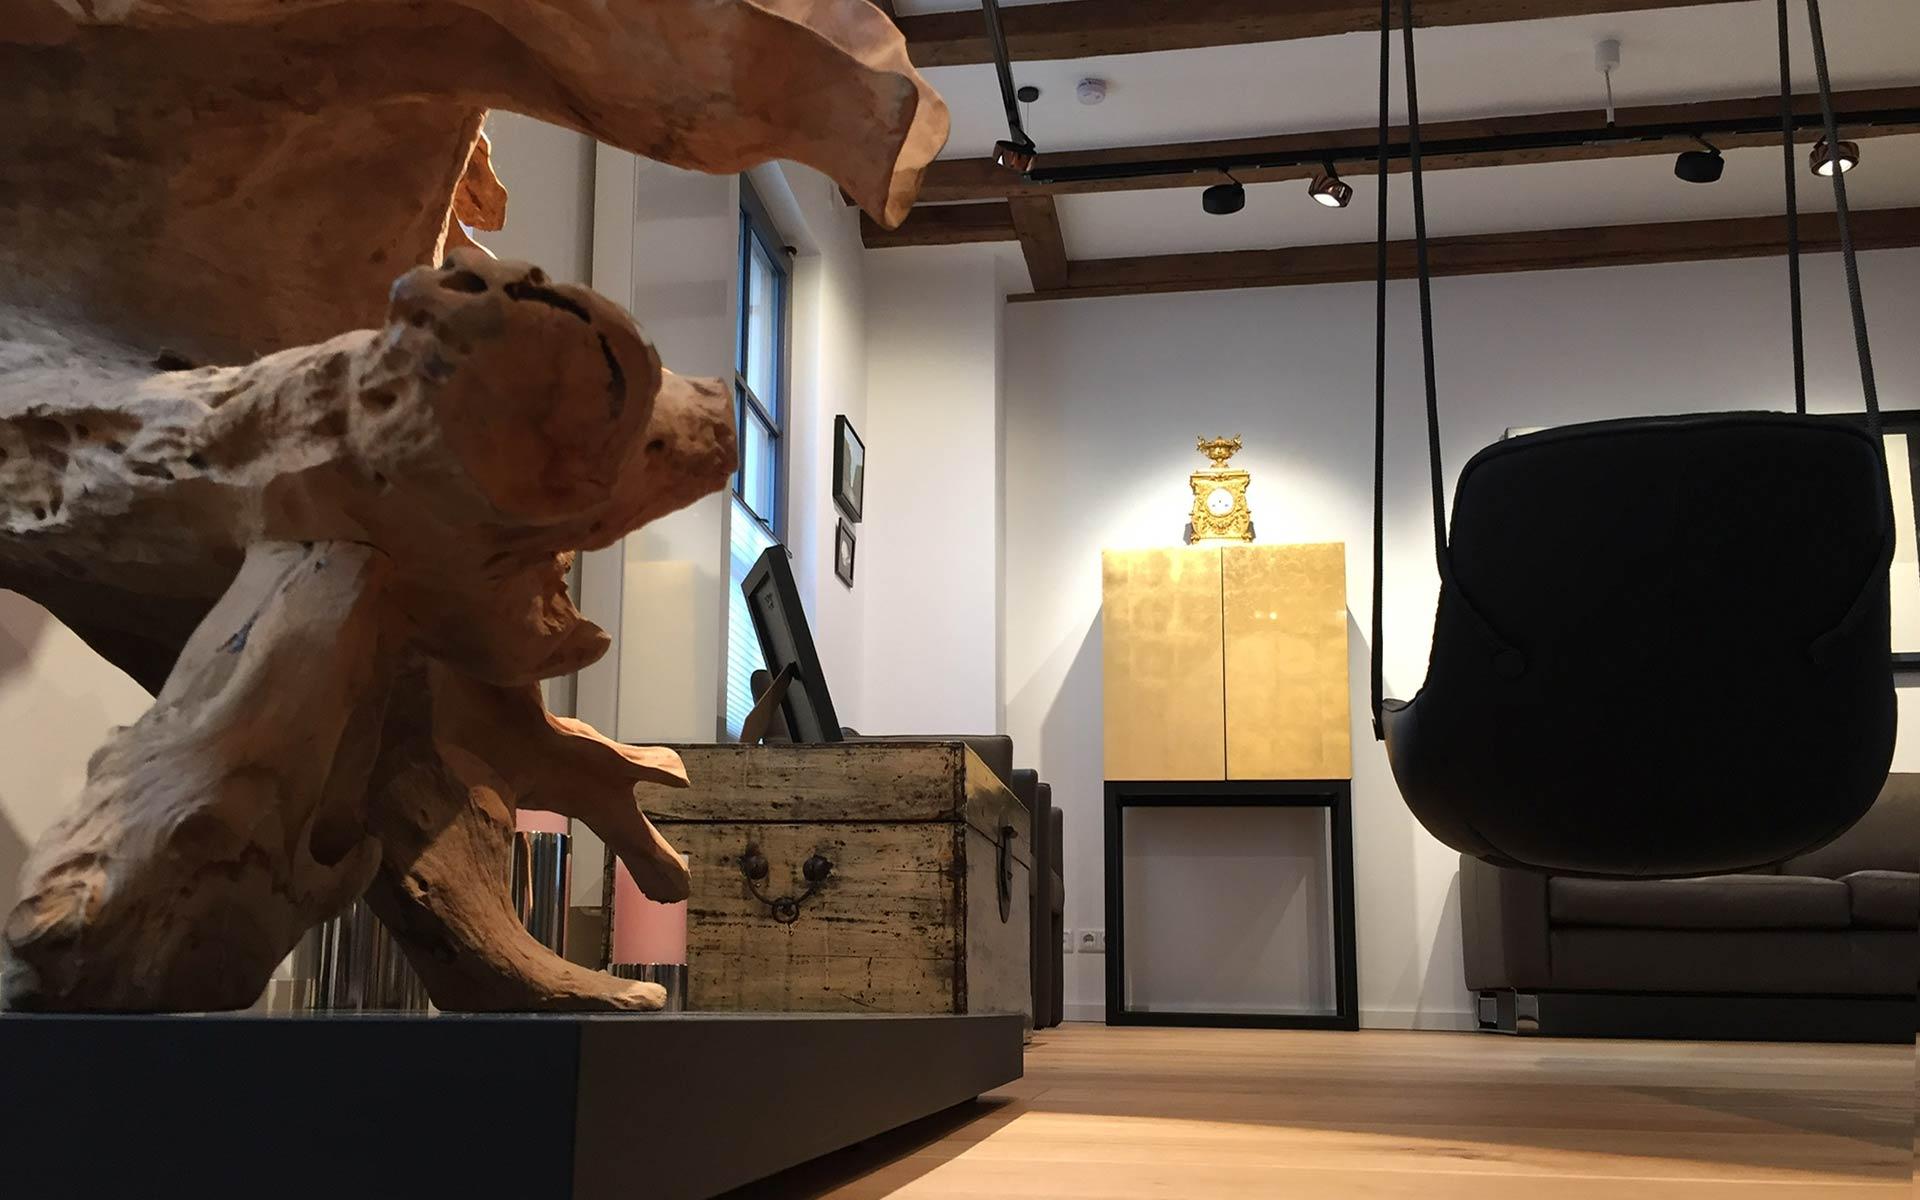 Freifrau Leya Swing Seat + Occhio Beleuchtung - Interiordesign steidten+ Berlin